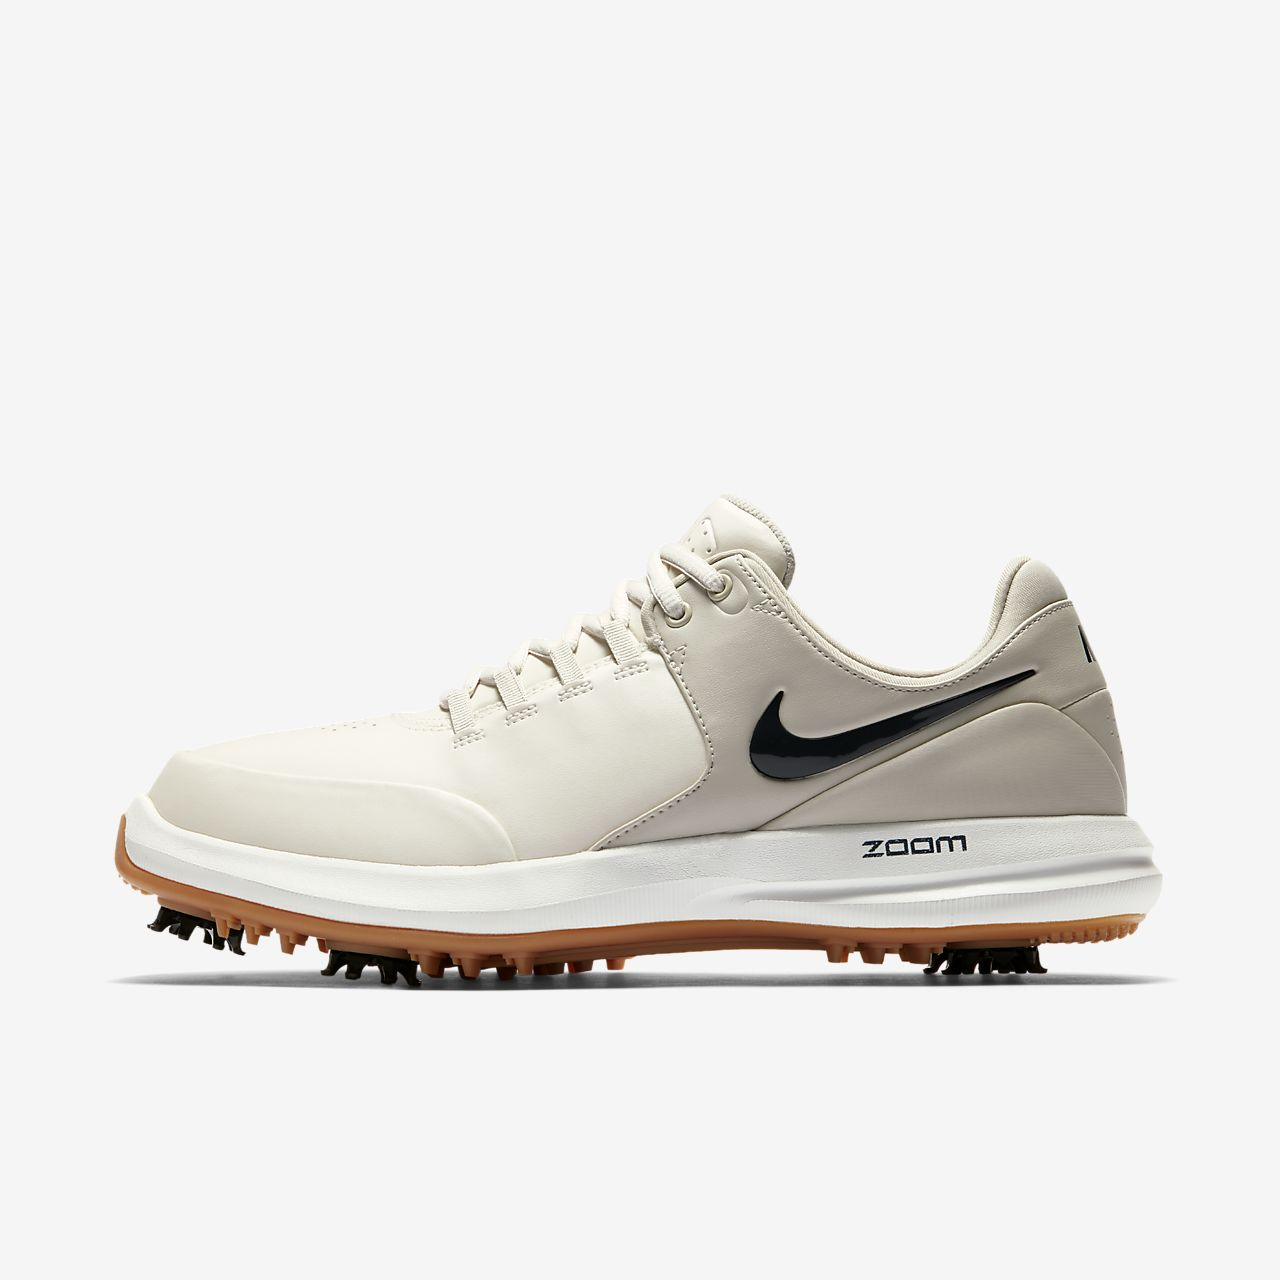 dd81a3ae6c0e8 Nike Air Zoom Accurate Men s Golf Shoe. Nike.com CH